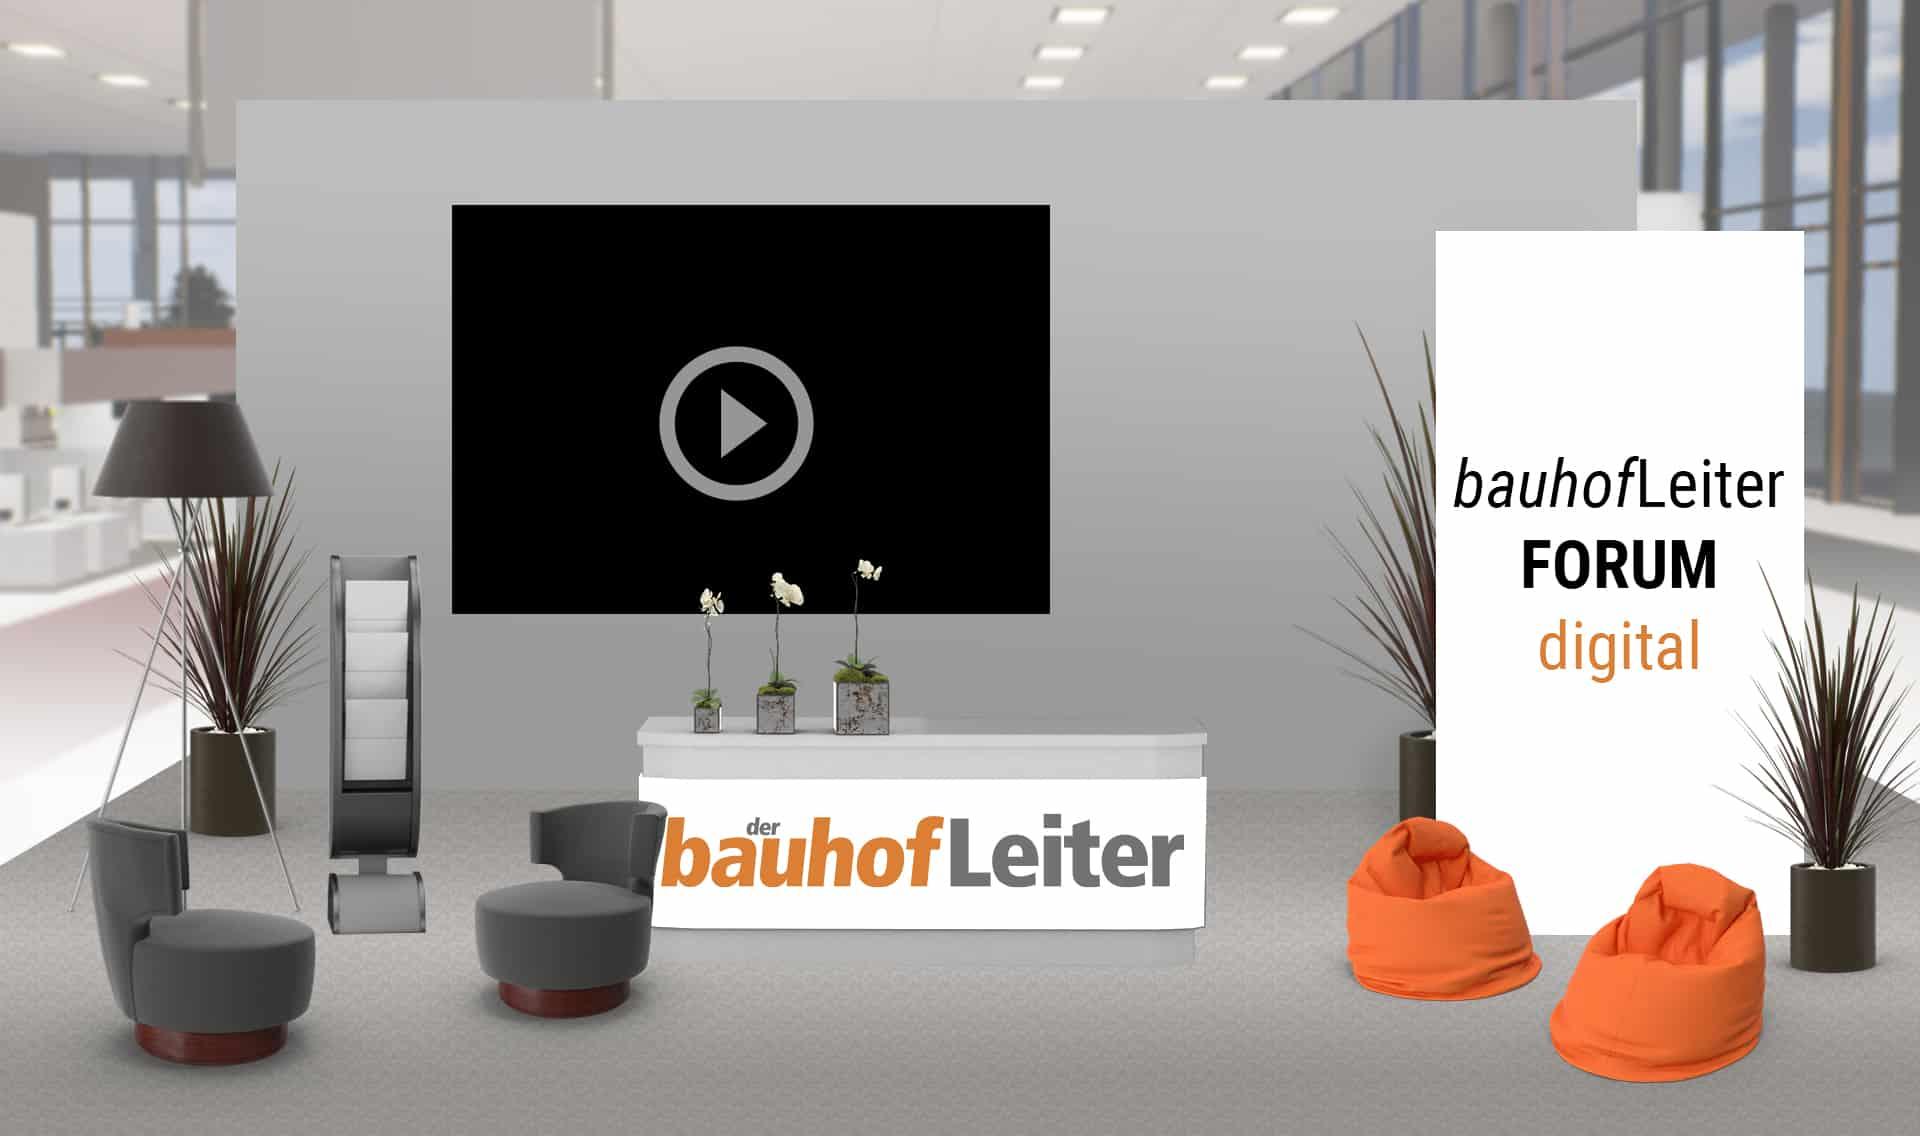 bauhofLeiterFORUM digital